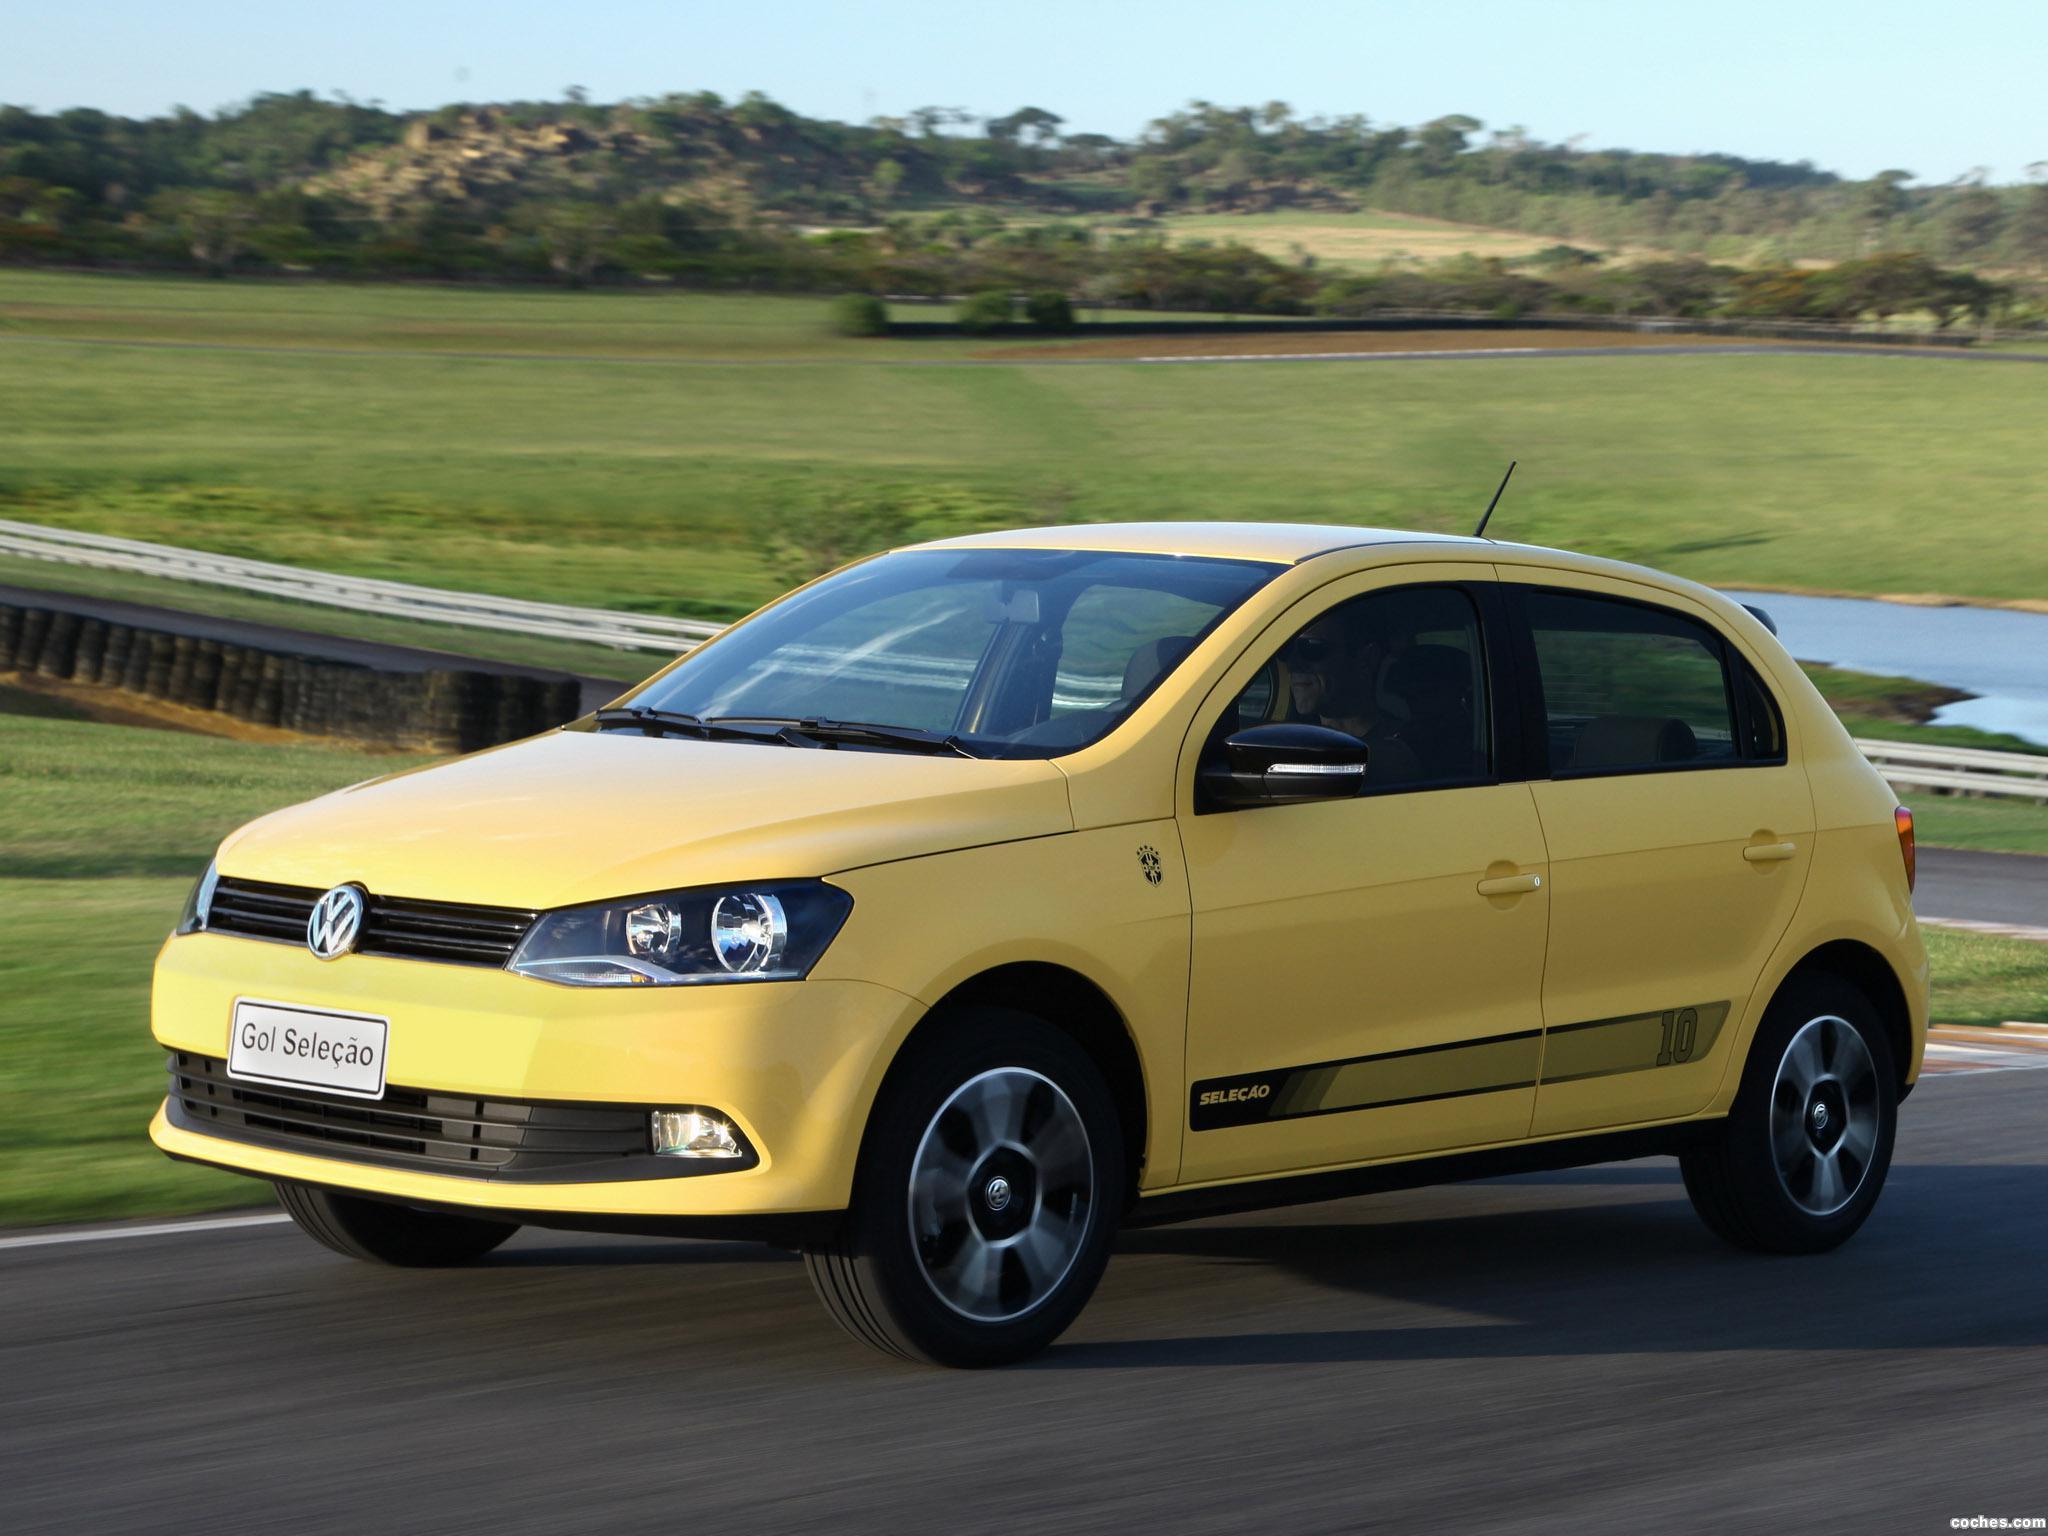 Foto 6 de Volkswagen Gol Selecao 2013